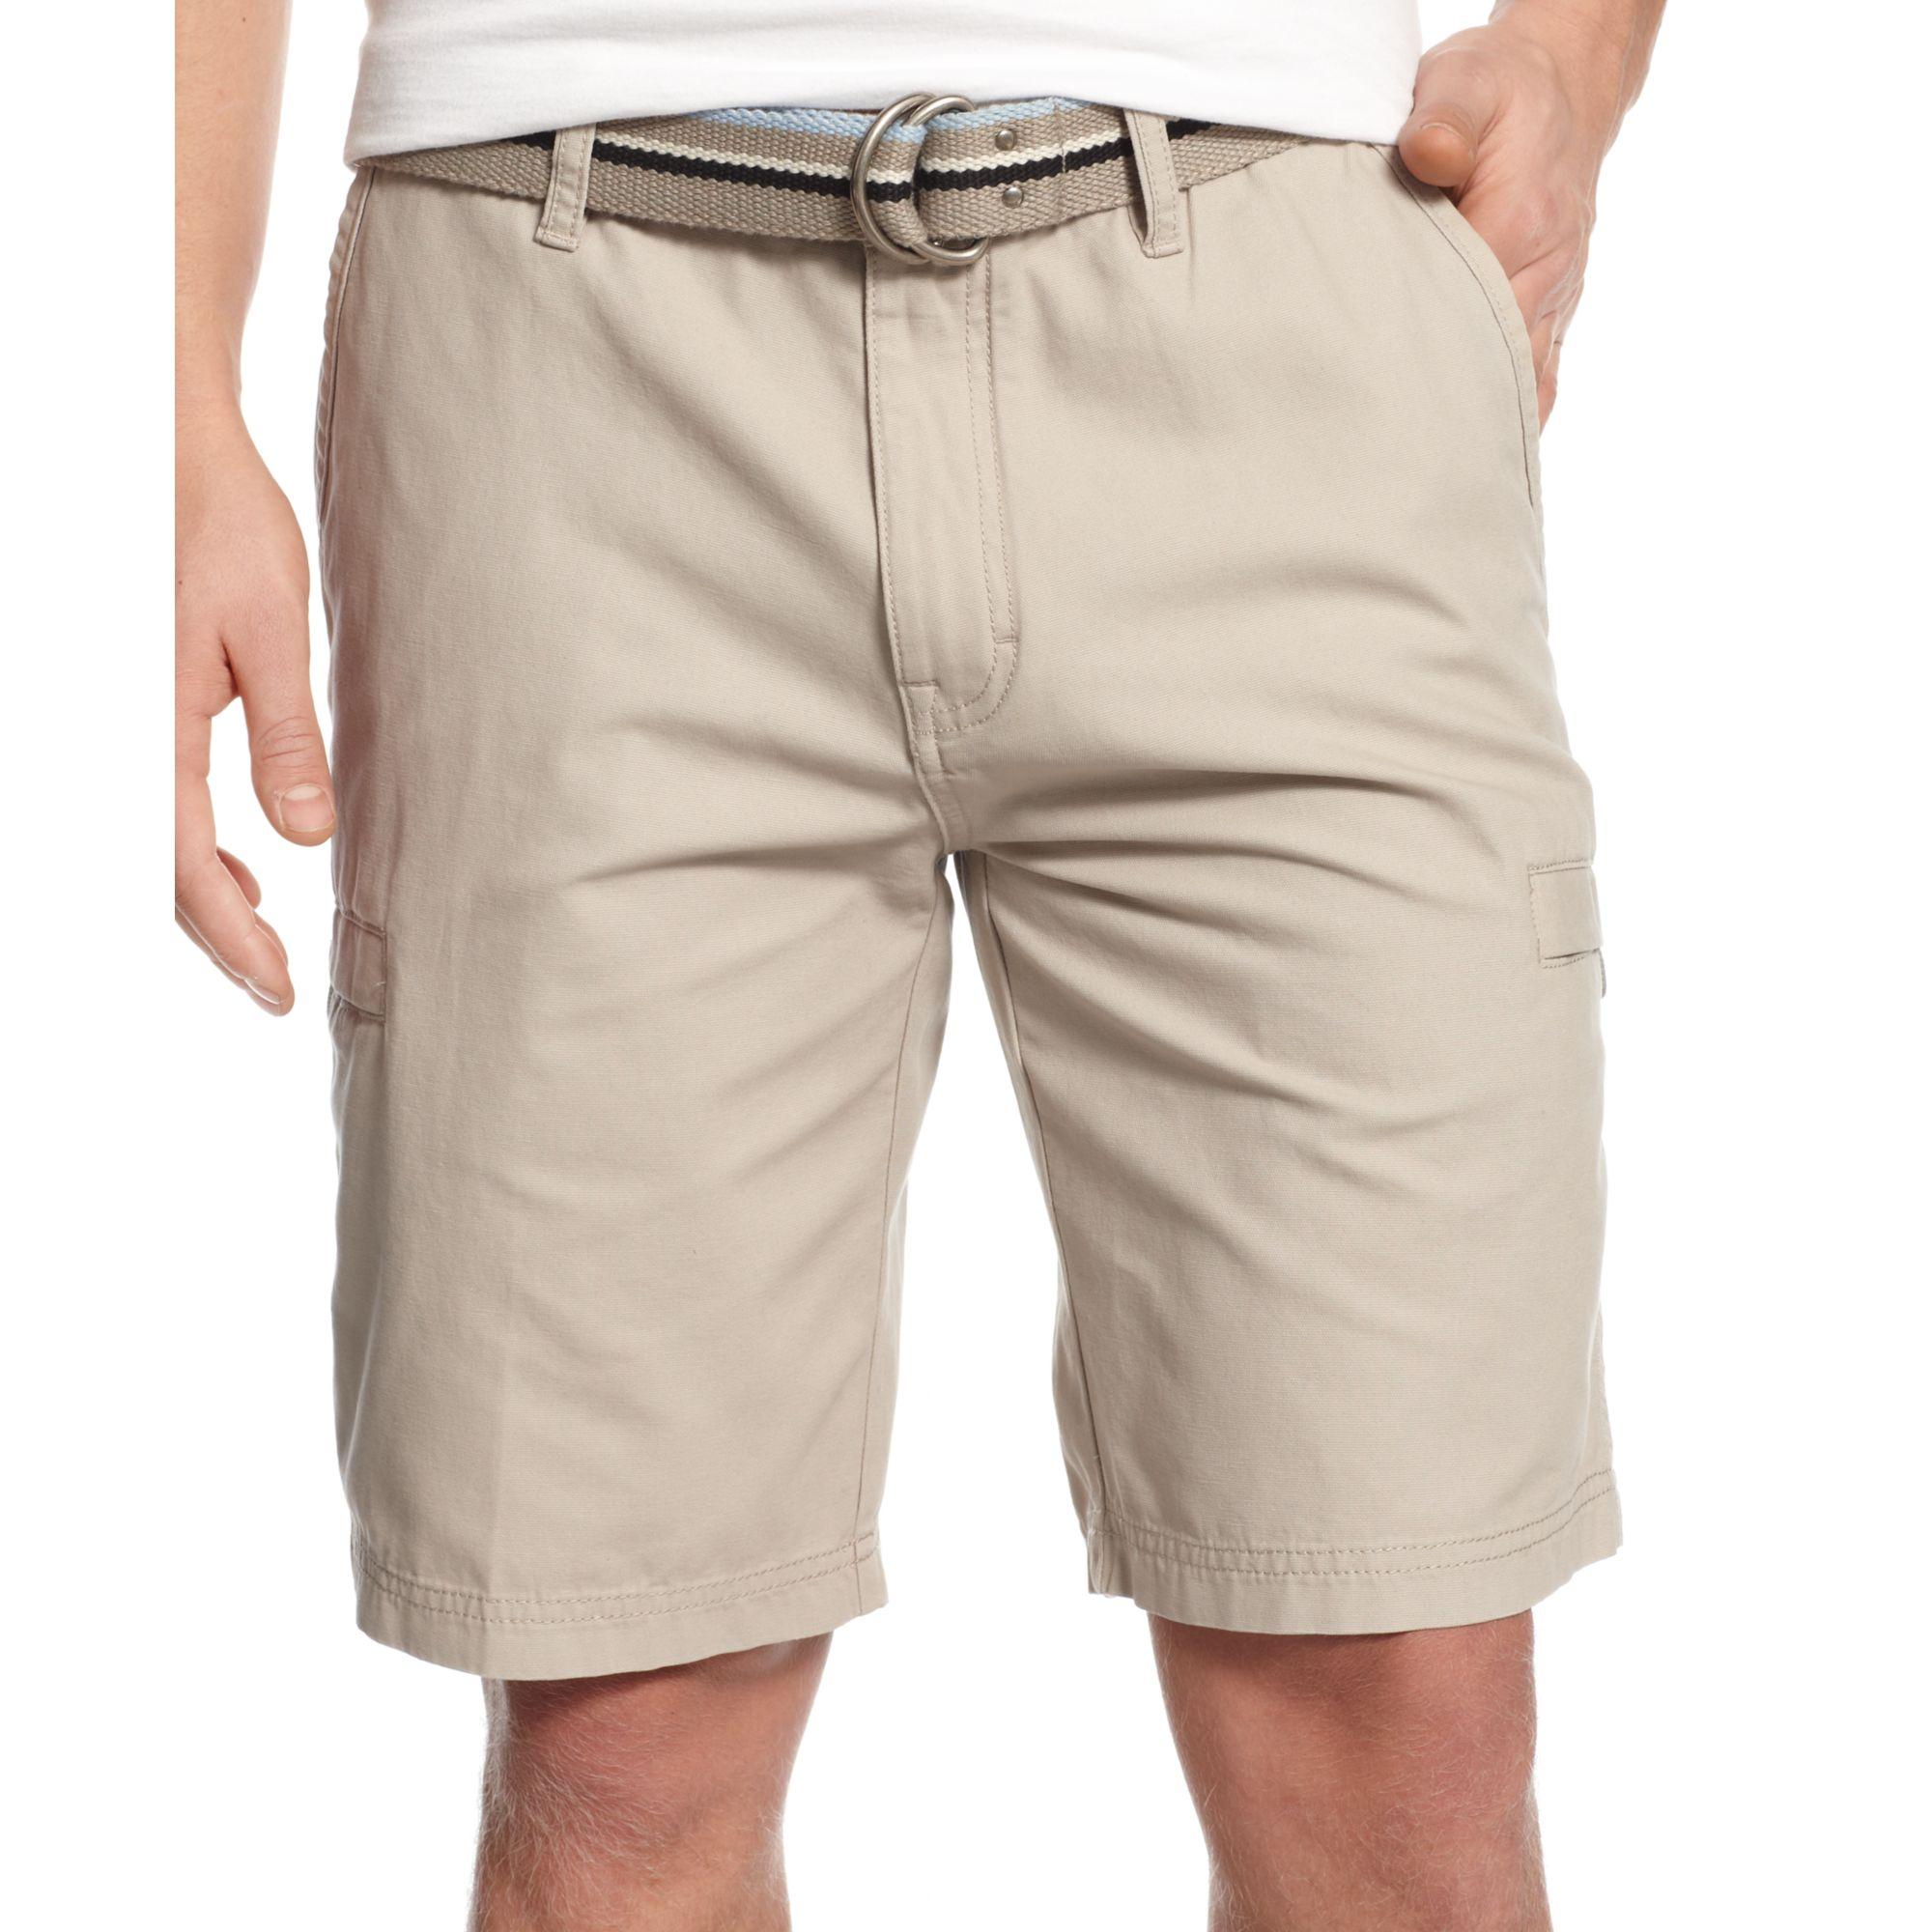 a340f28fe8 Weatherproof Vintage Canvas Belted Cargo Shorts in Natural for Men ...